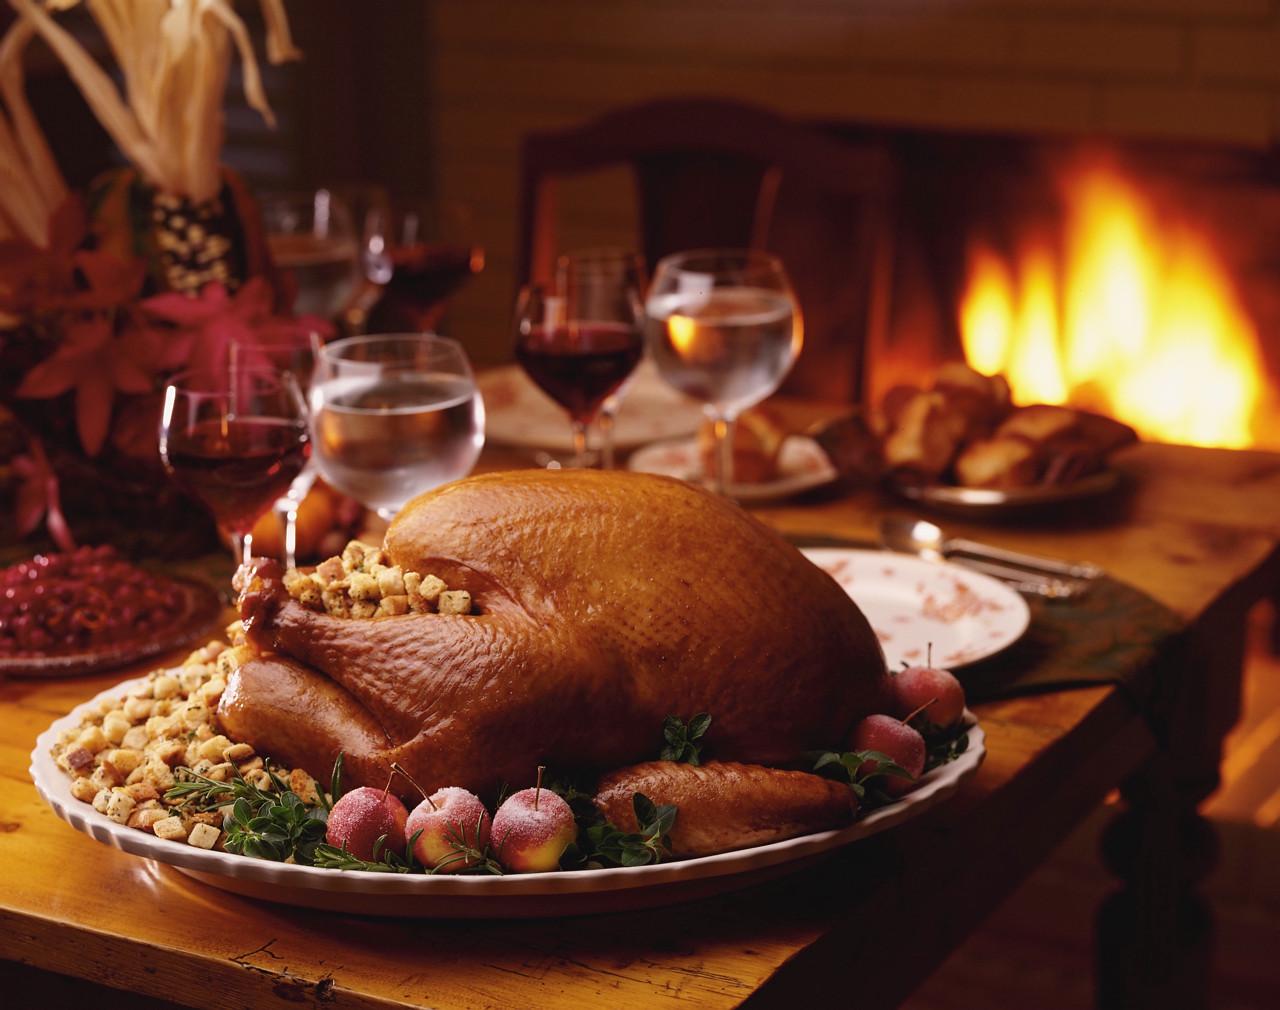 Enjoy your Thanksgiving!